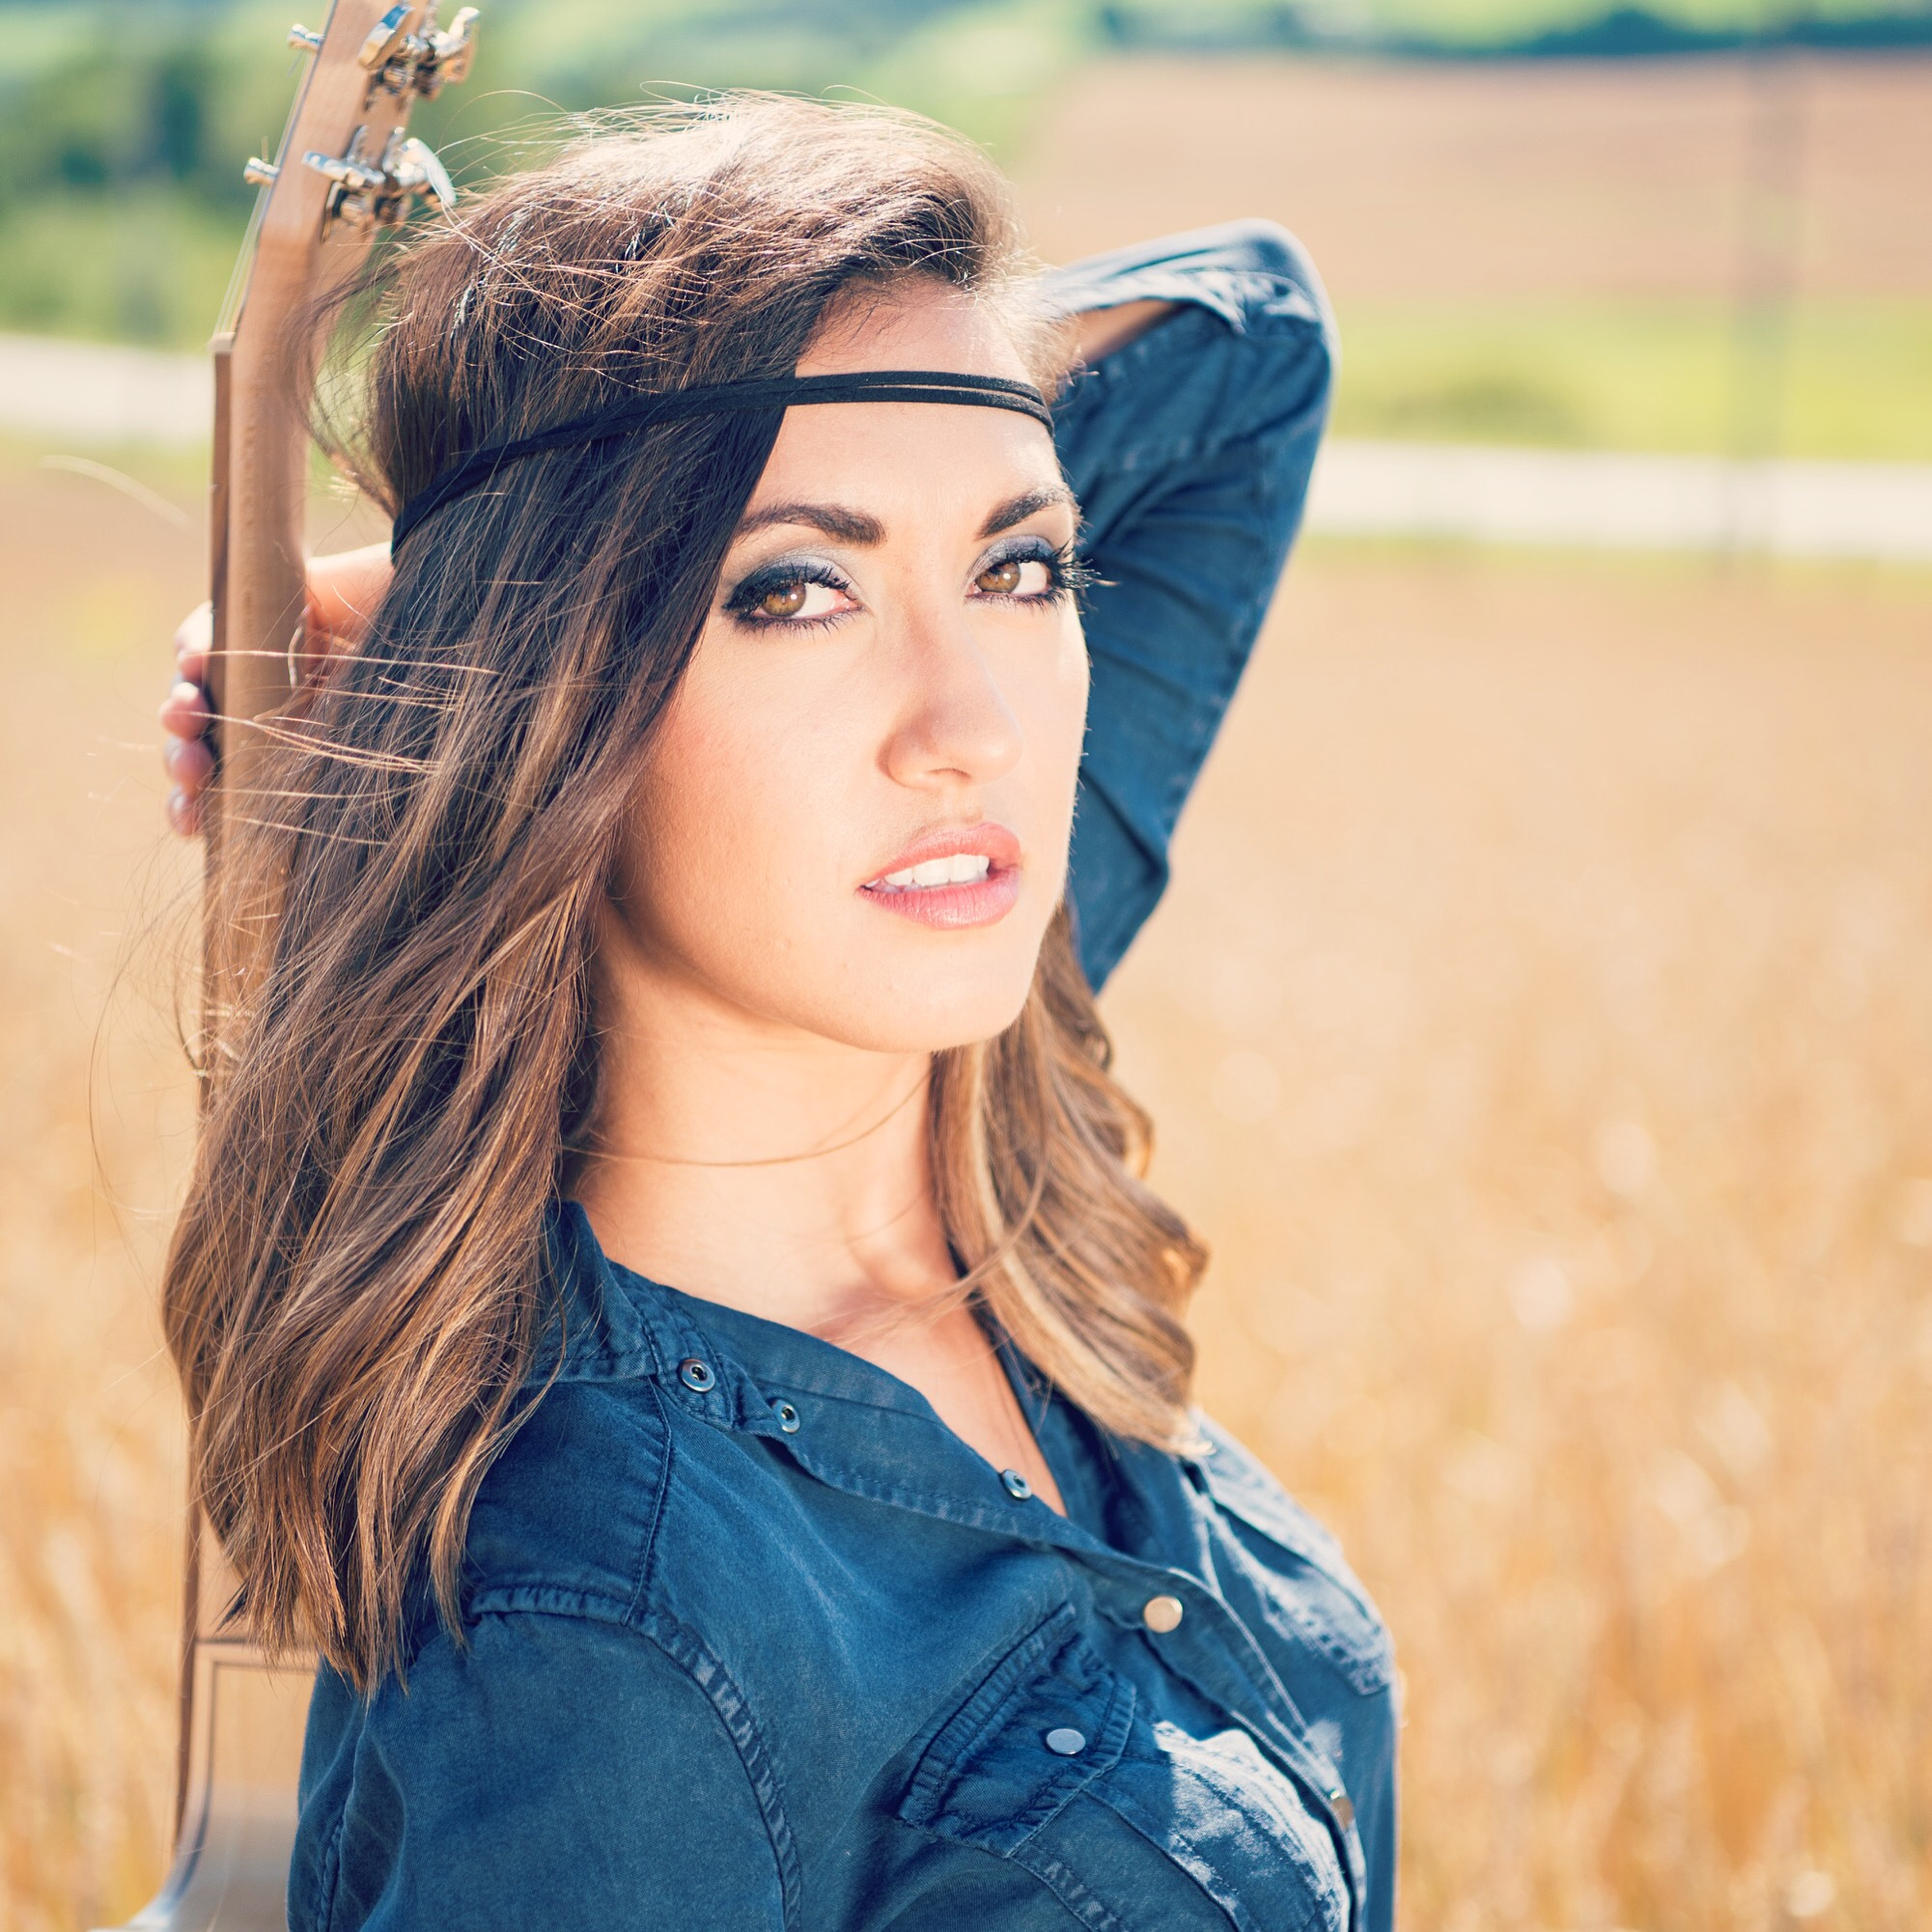 Genre  :Country-pop \ Folk-pop  Hometown : Saint-Prosper, Quebec, Canada